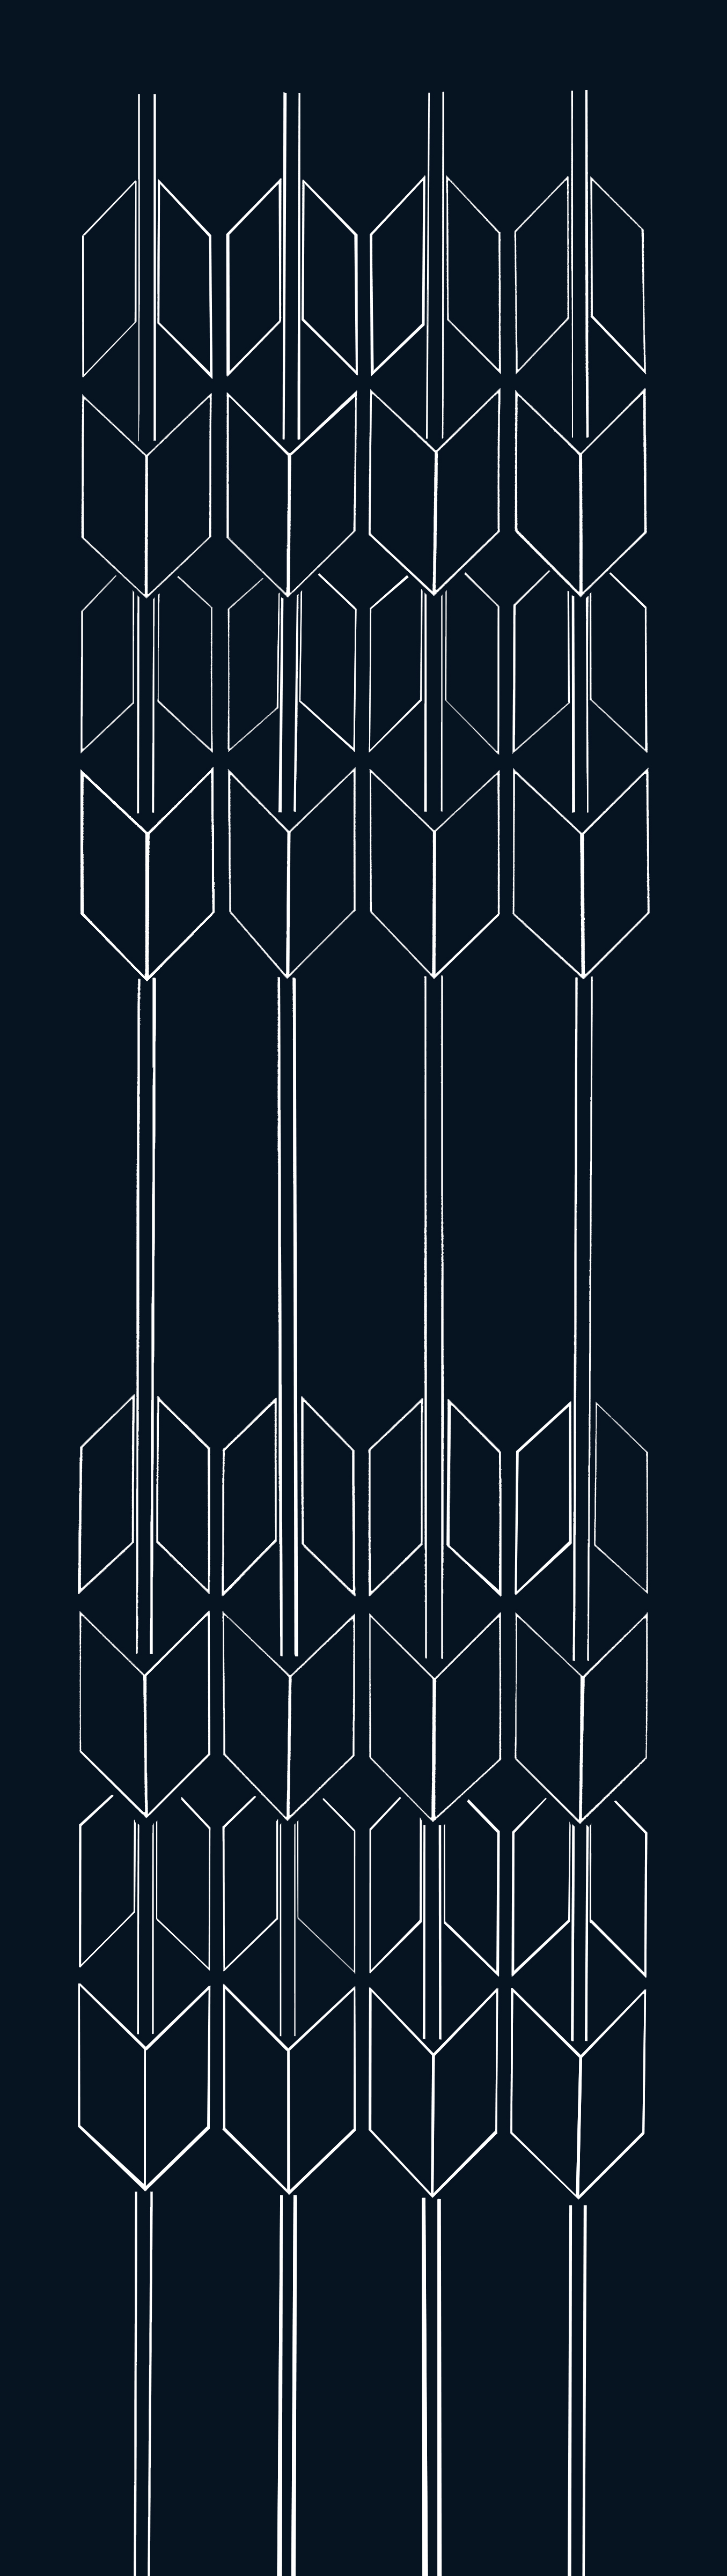 Doce cruces / Twelve crosses.